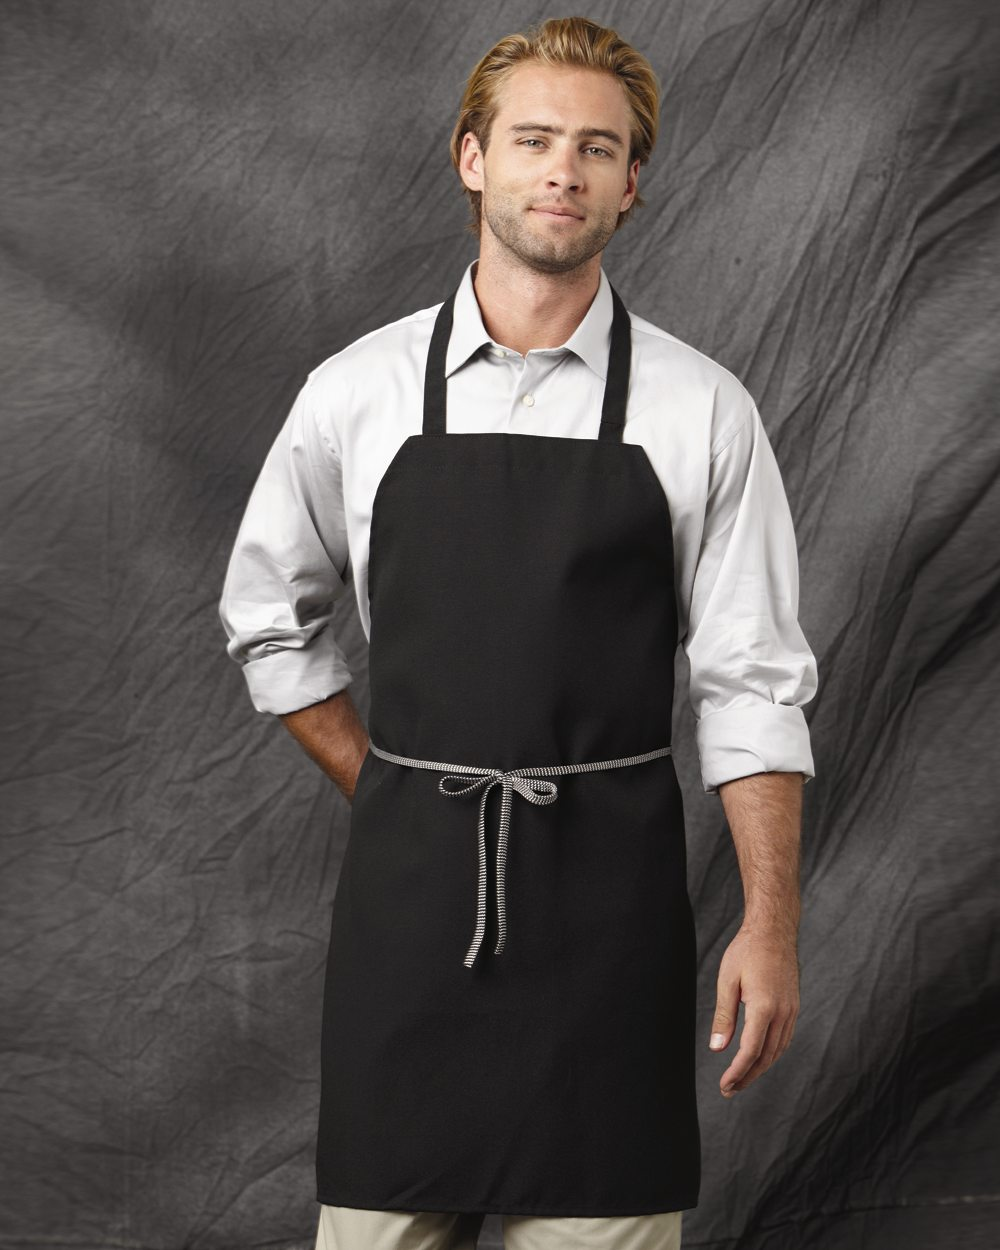 Chef Designs 2500 - Standard Bib Apron